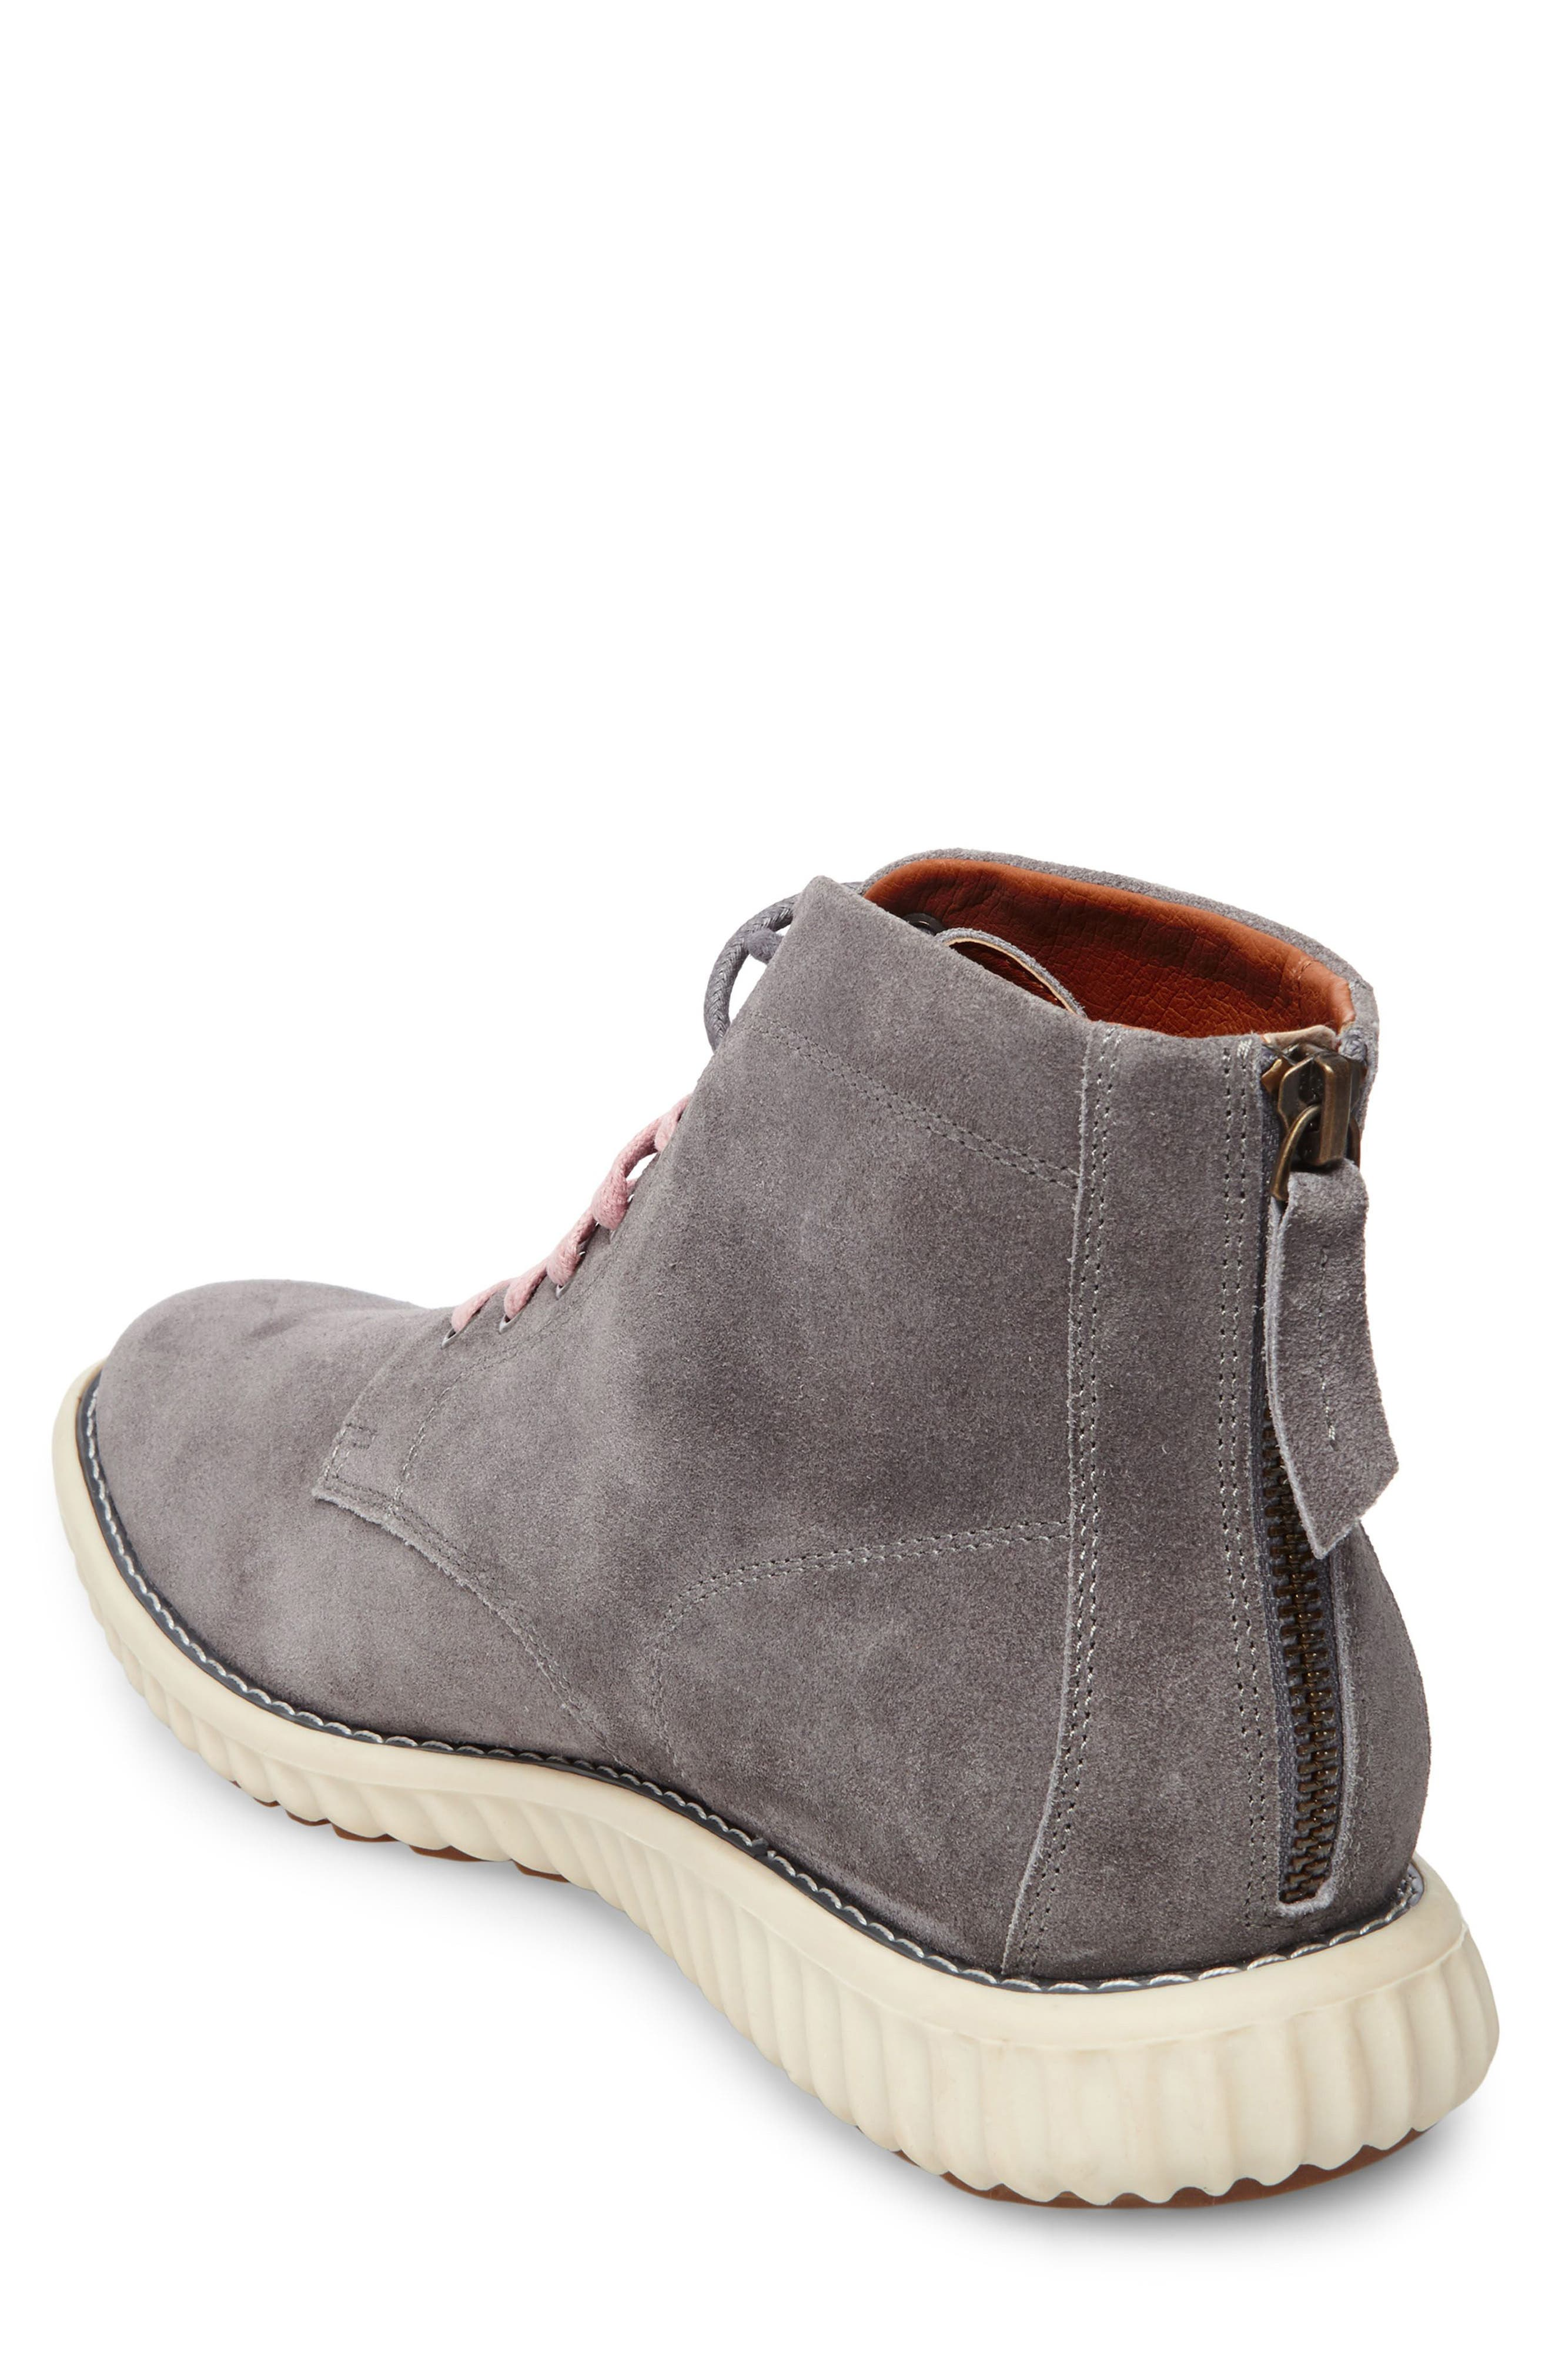 Verner Suede Plain Toe Boot,                             Alternate thumbnail 2, color,                             074